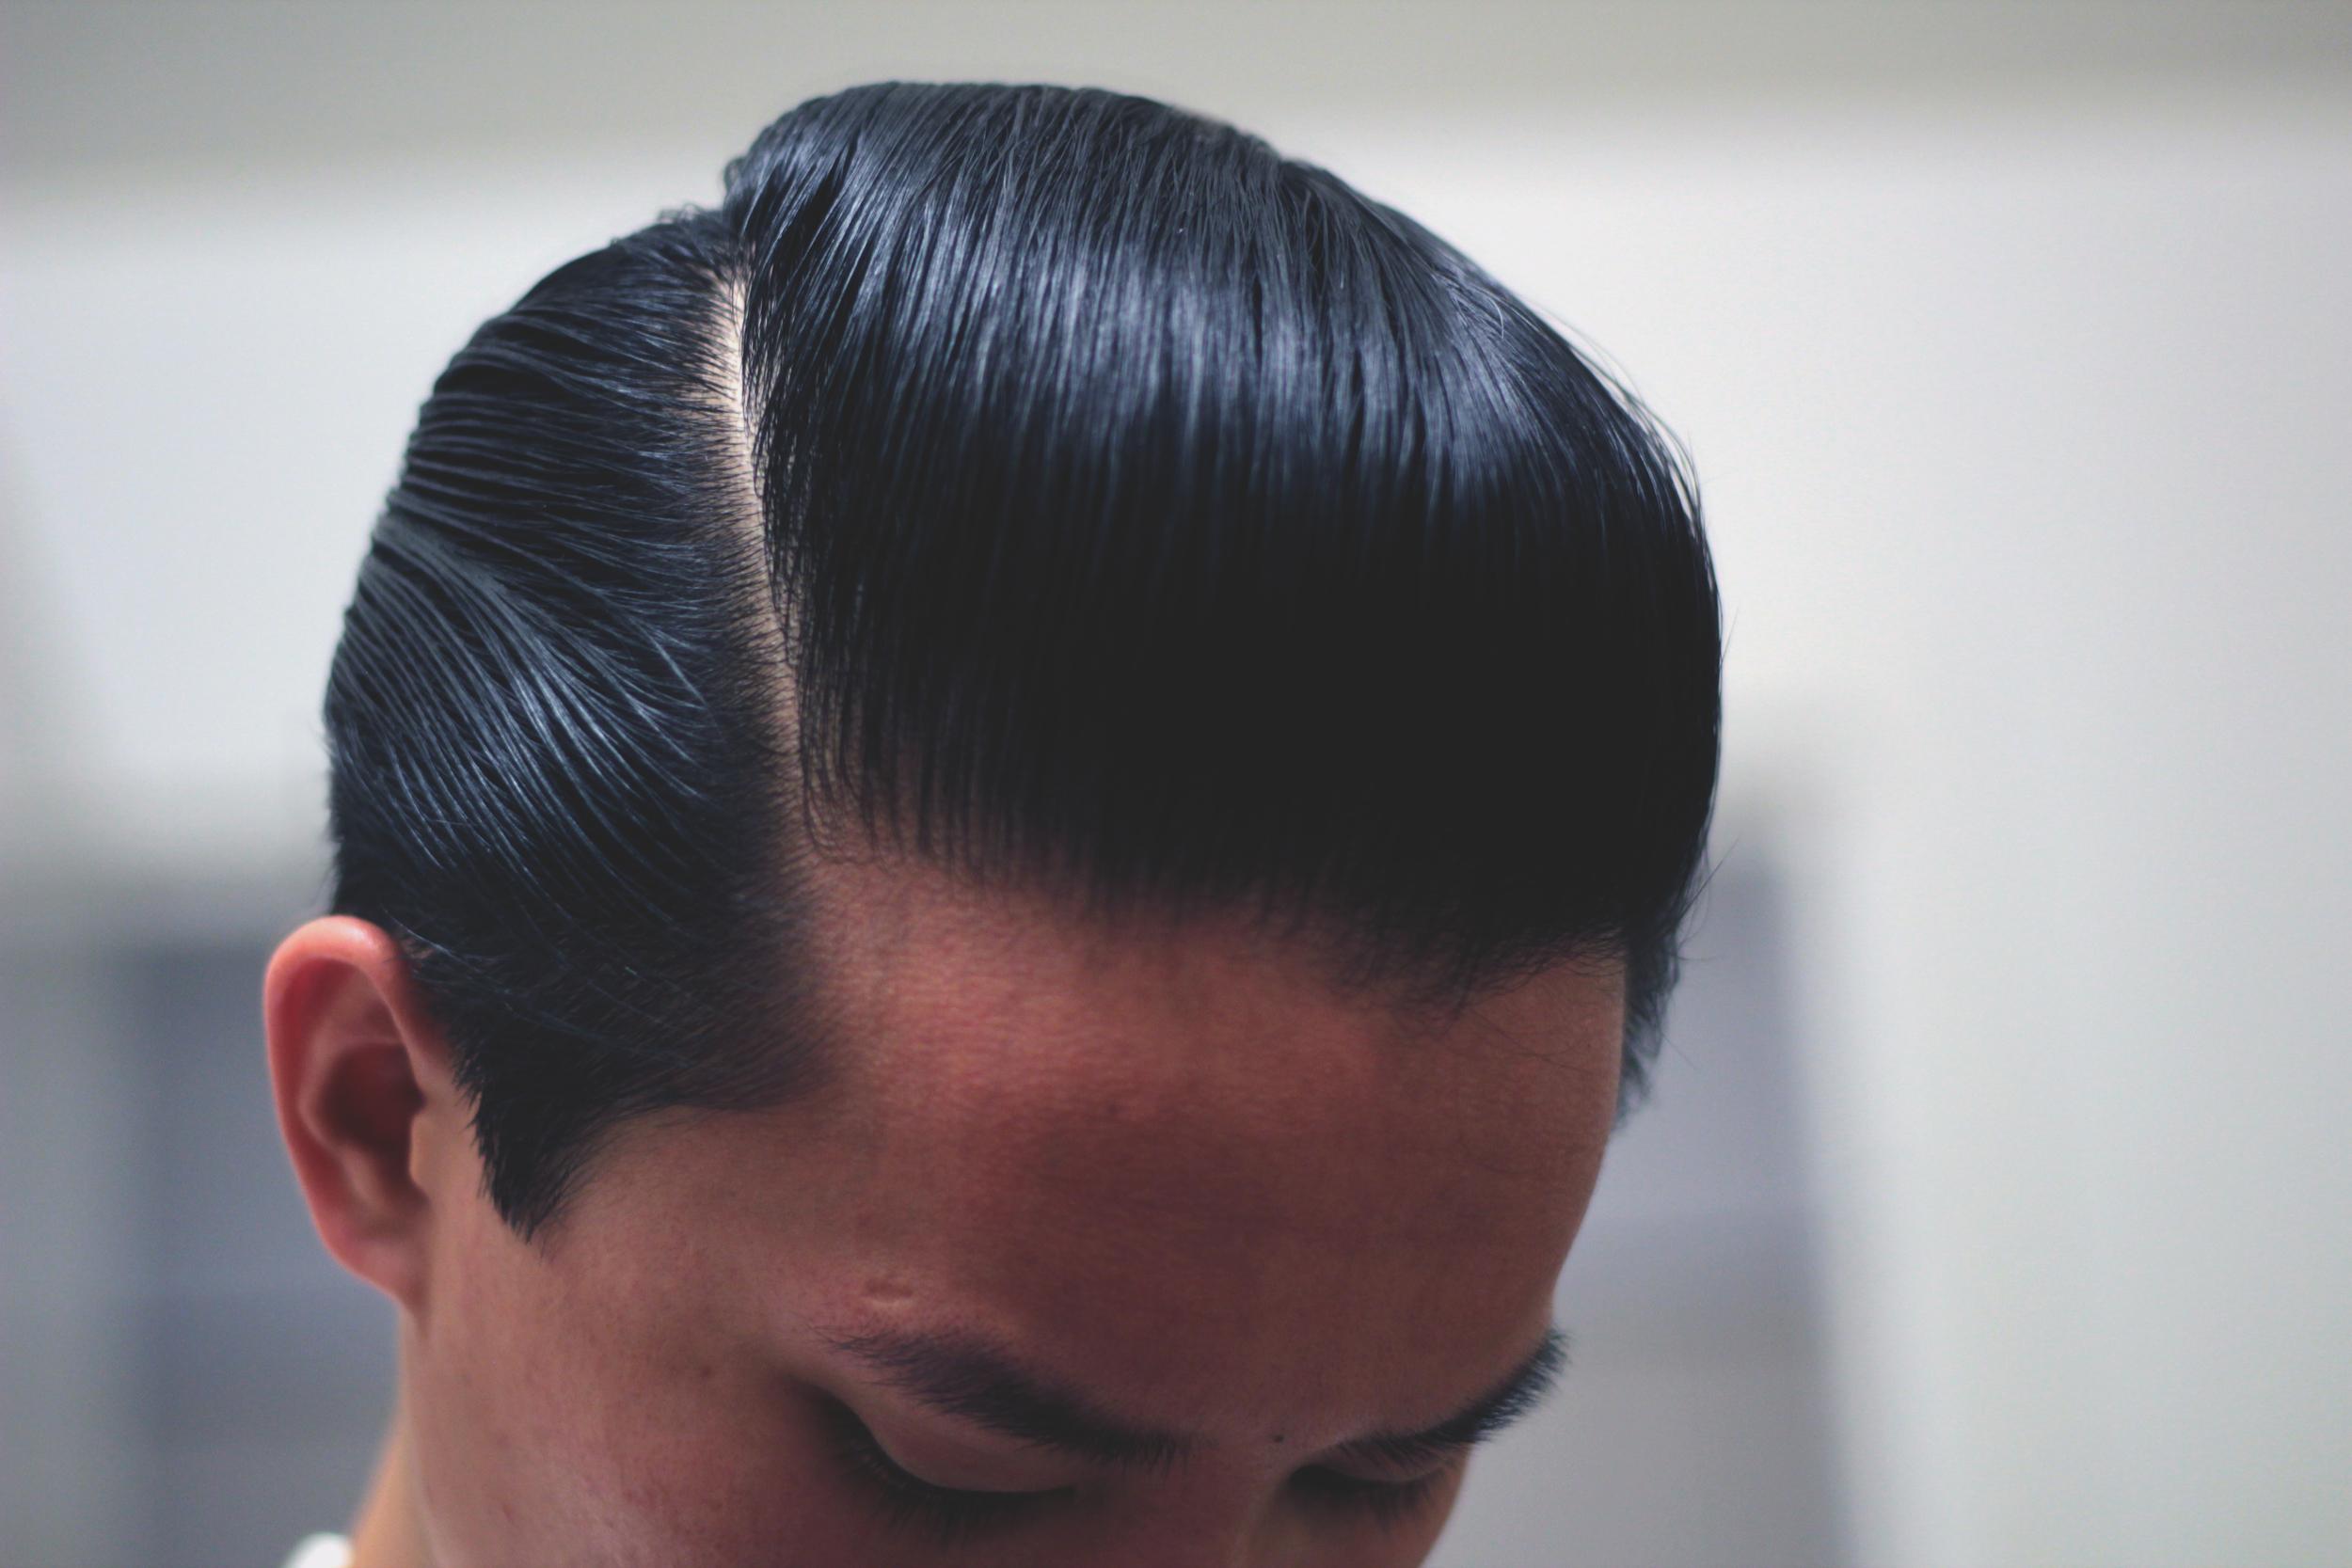 lockhart's goon grease hair pomade - pomp part